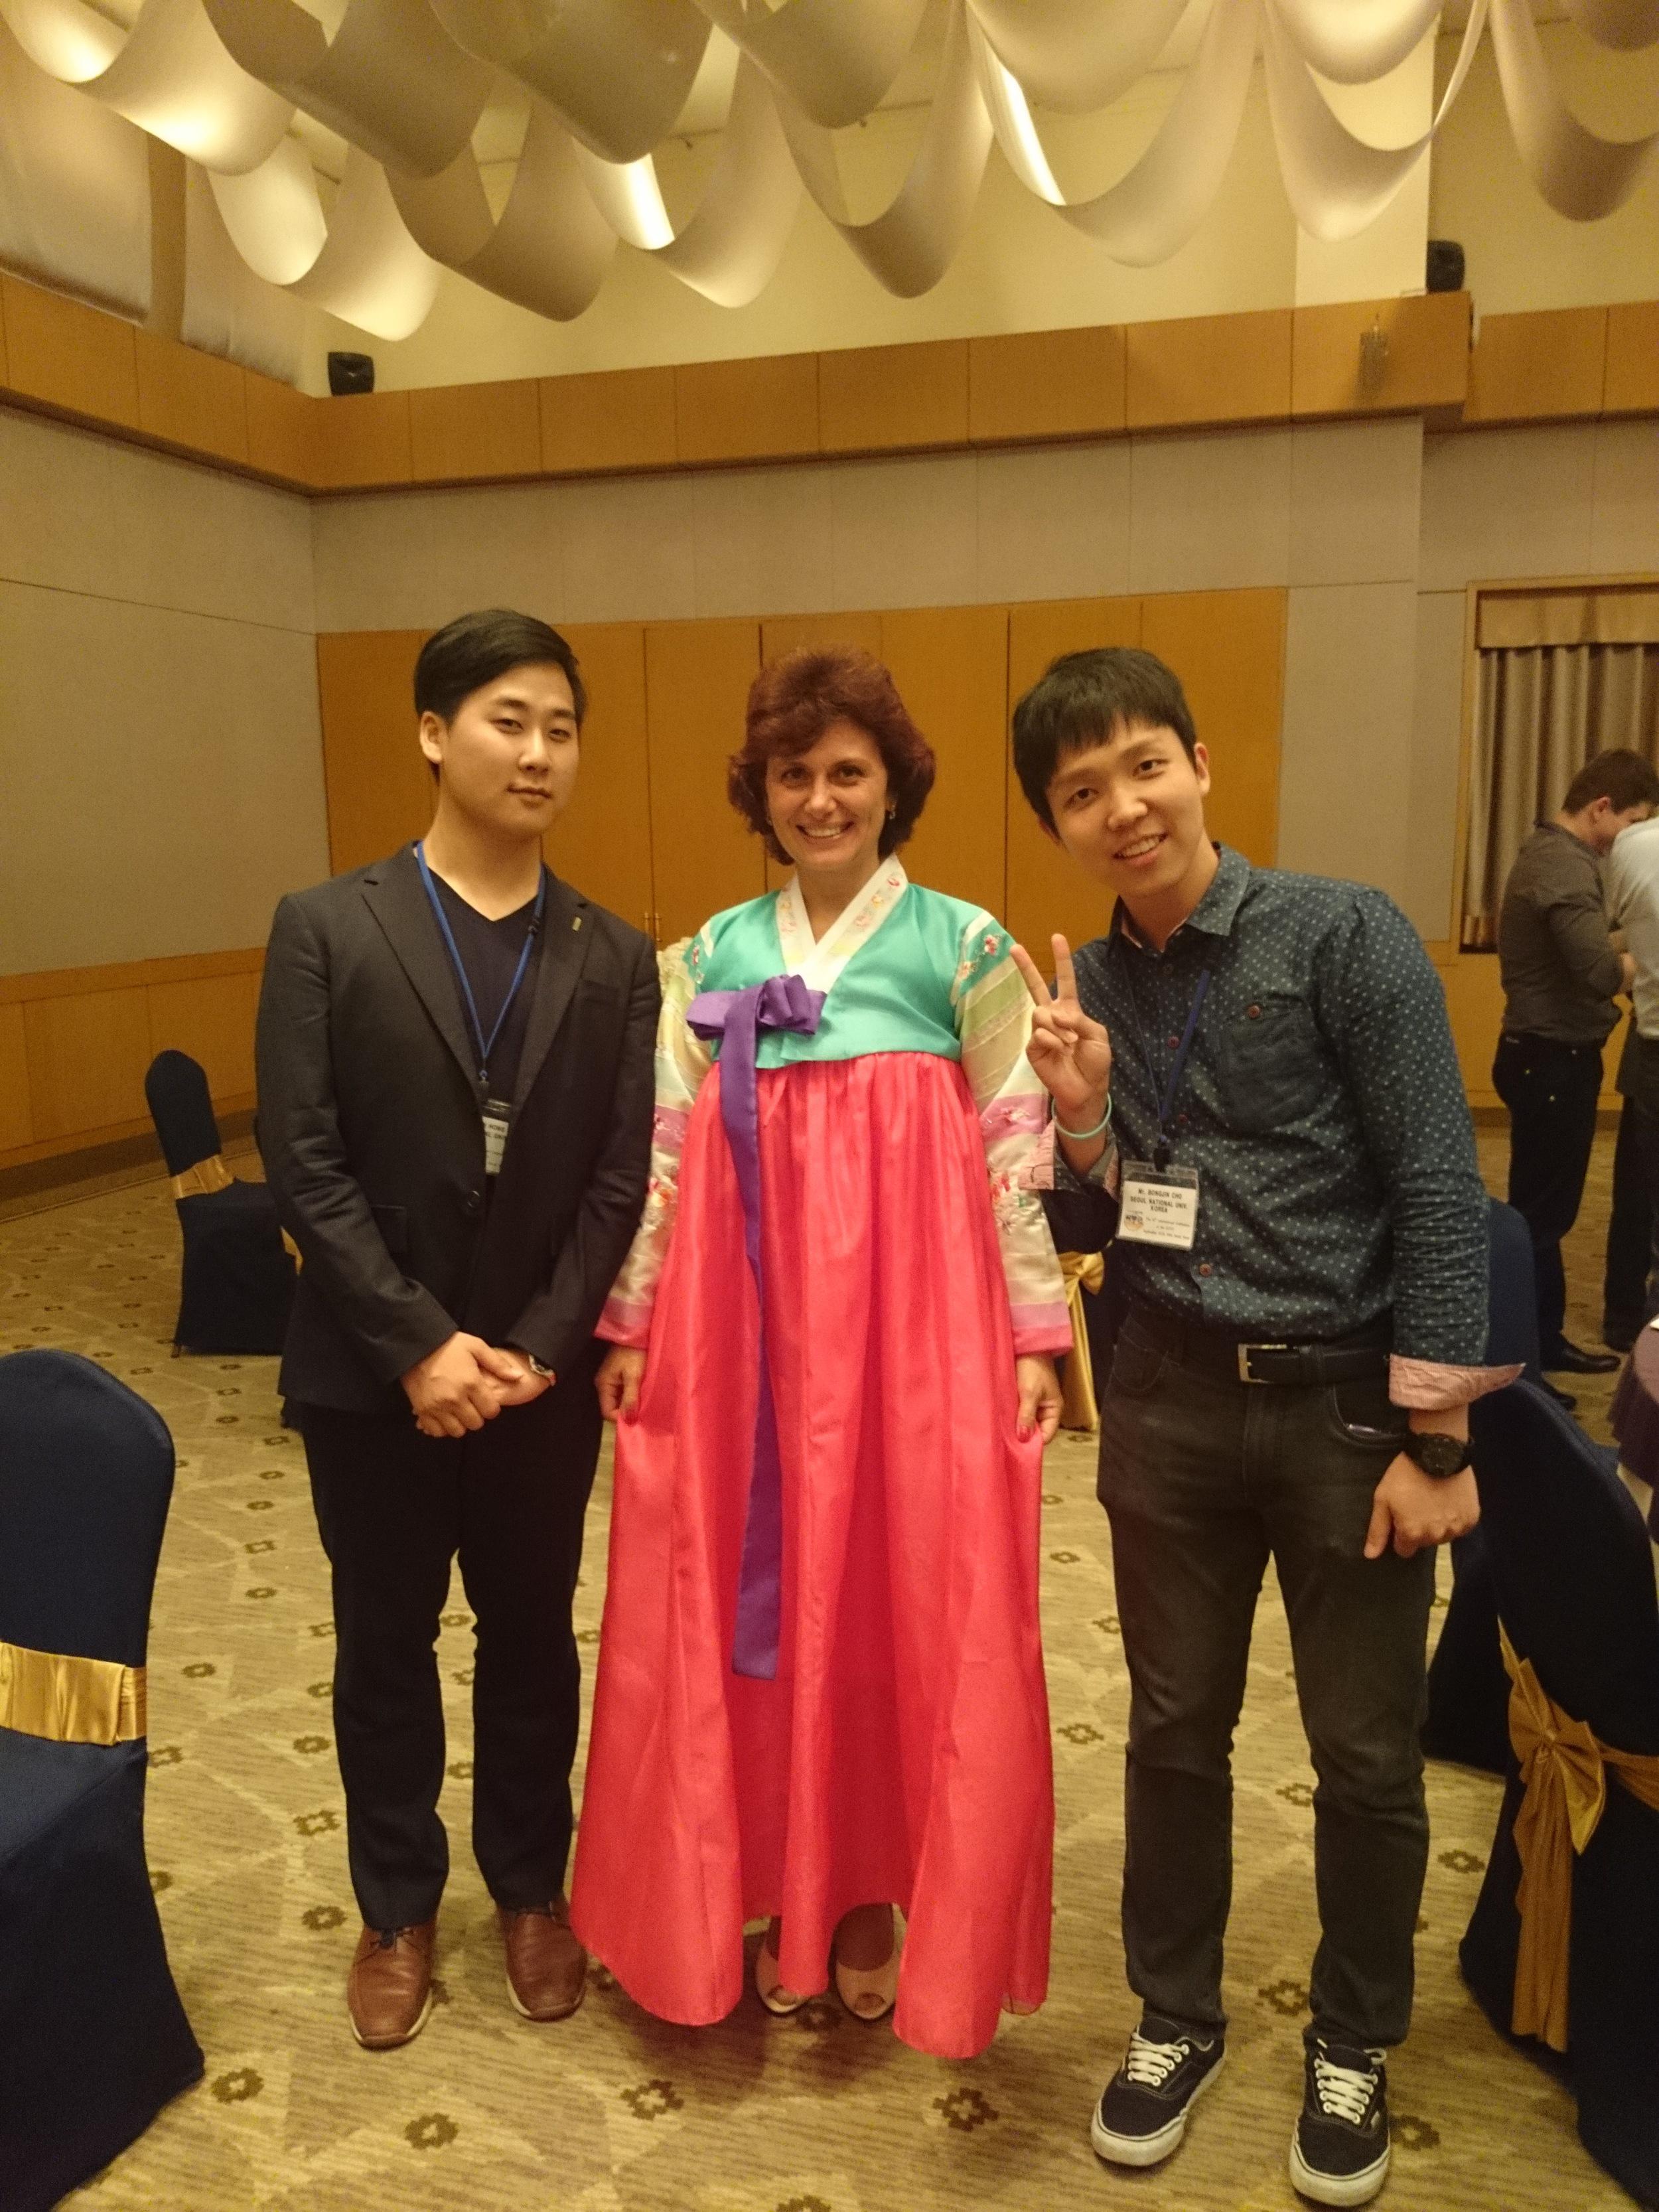 istvs_seoul2014-kim_Dr. Sandu in Korean traditional costume.jpg